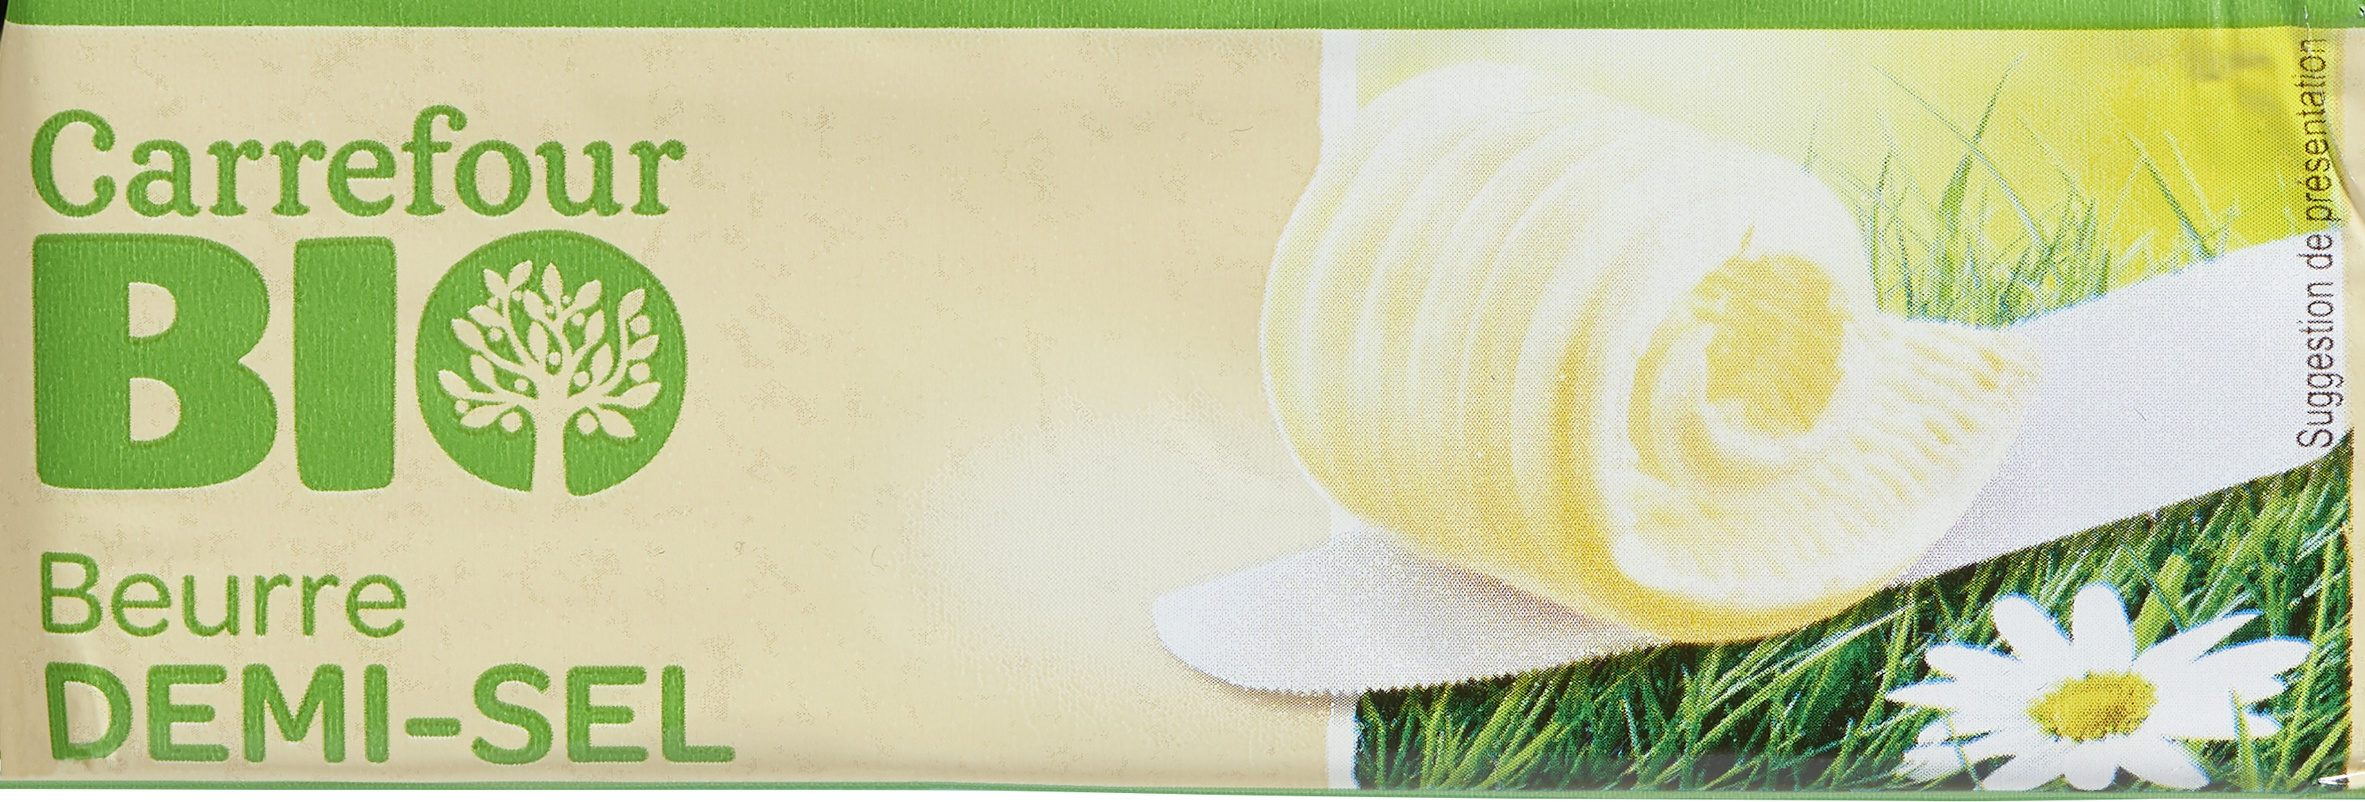 Beurre demi-sel bio - Product - fr